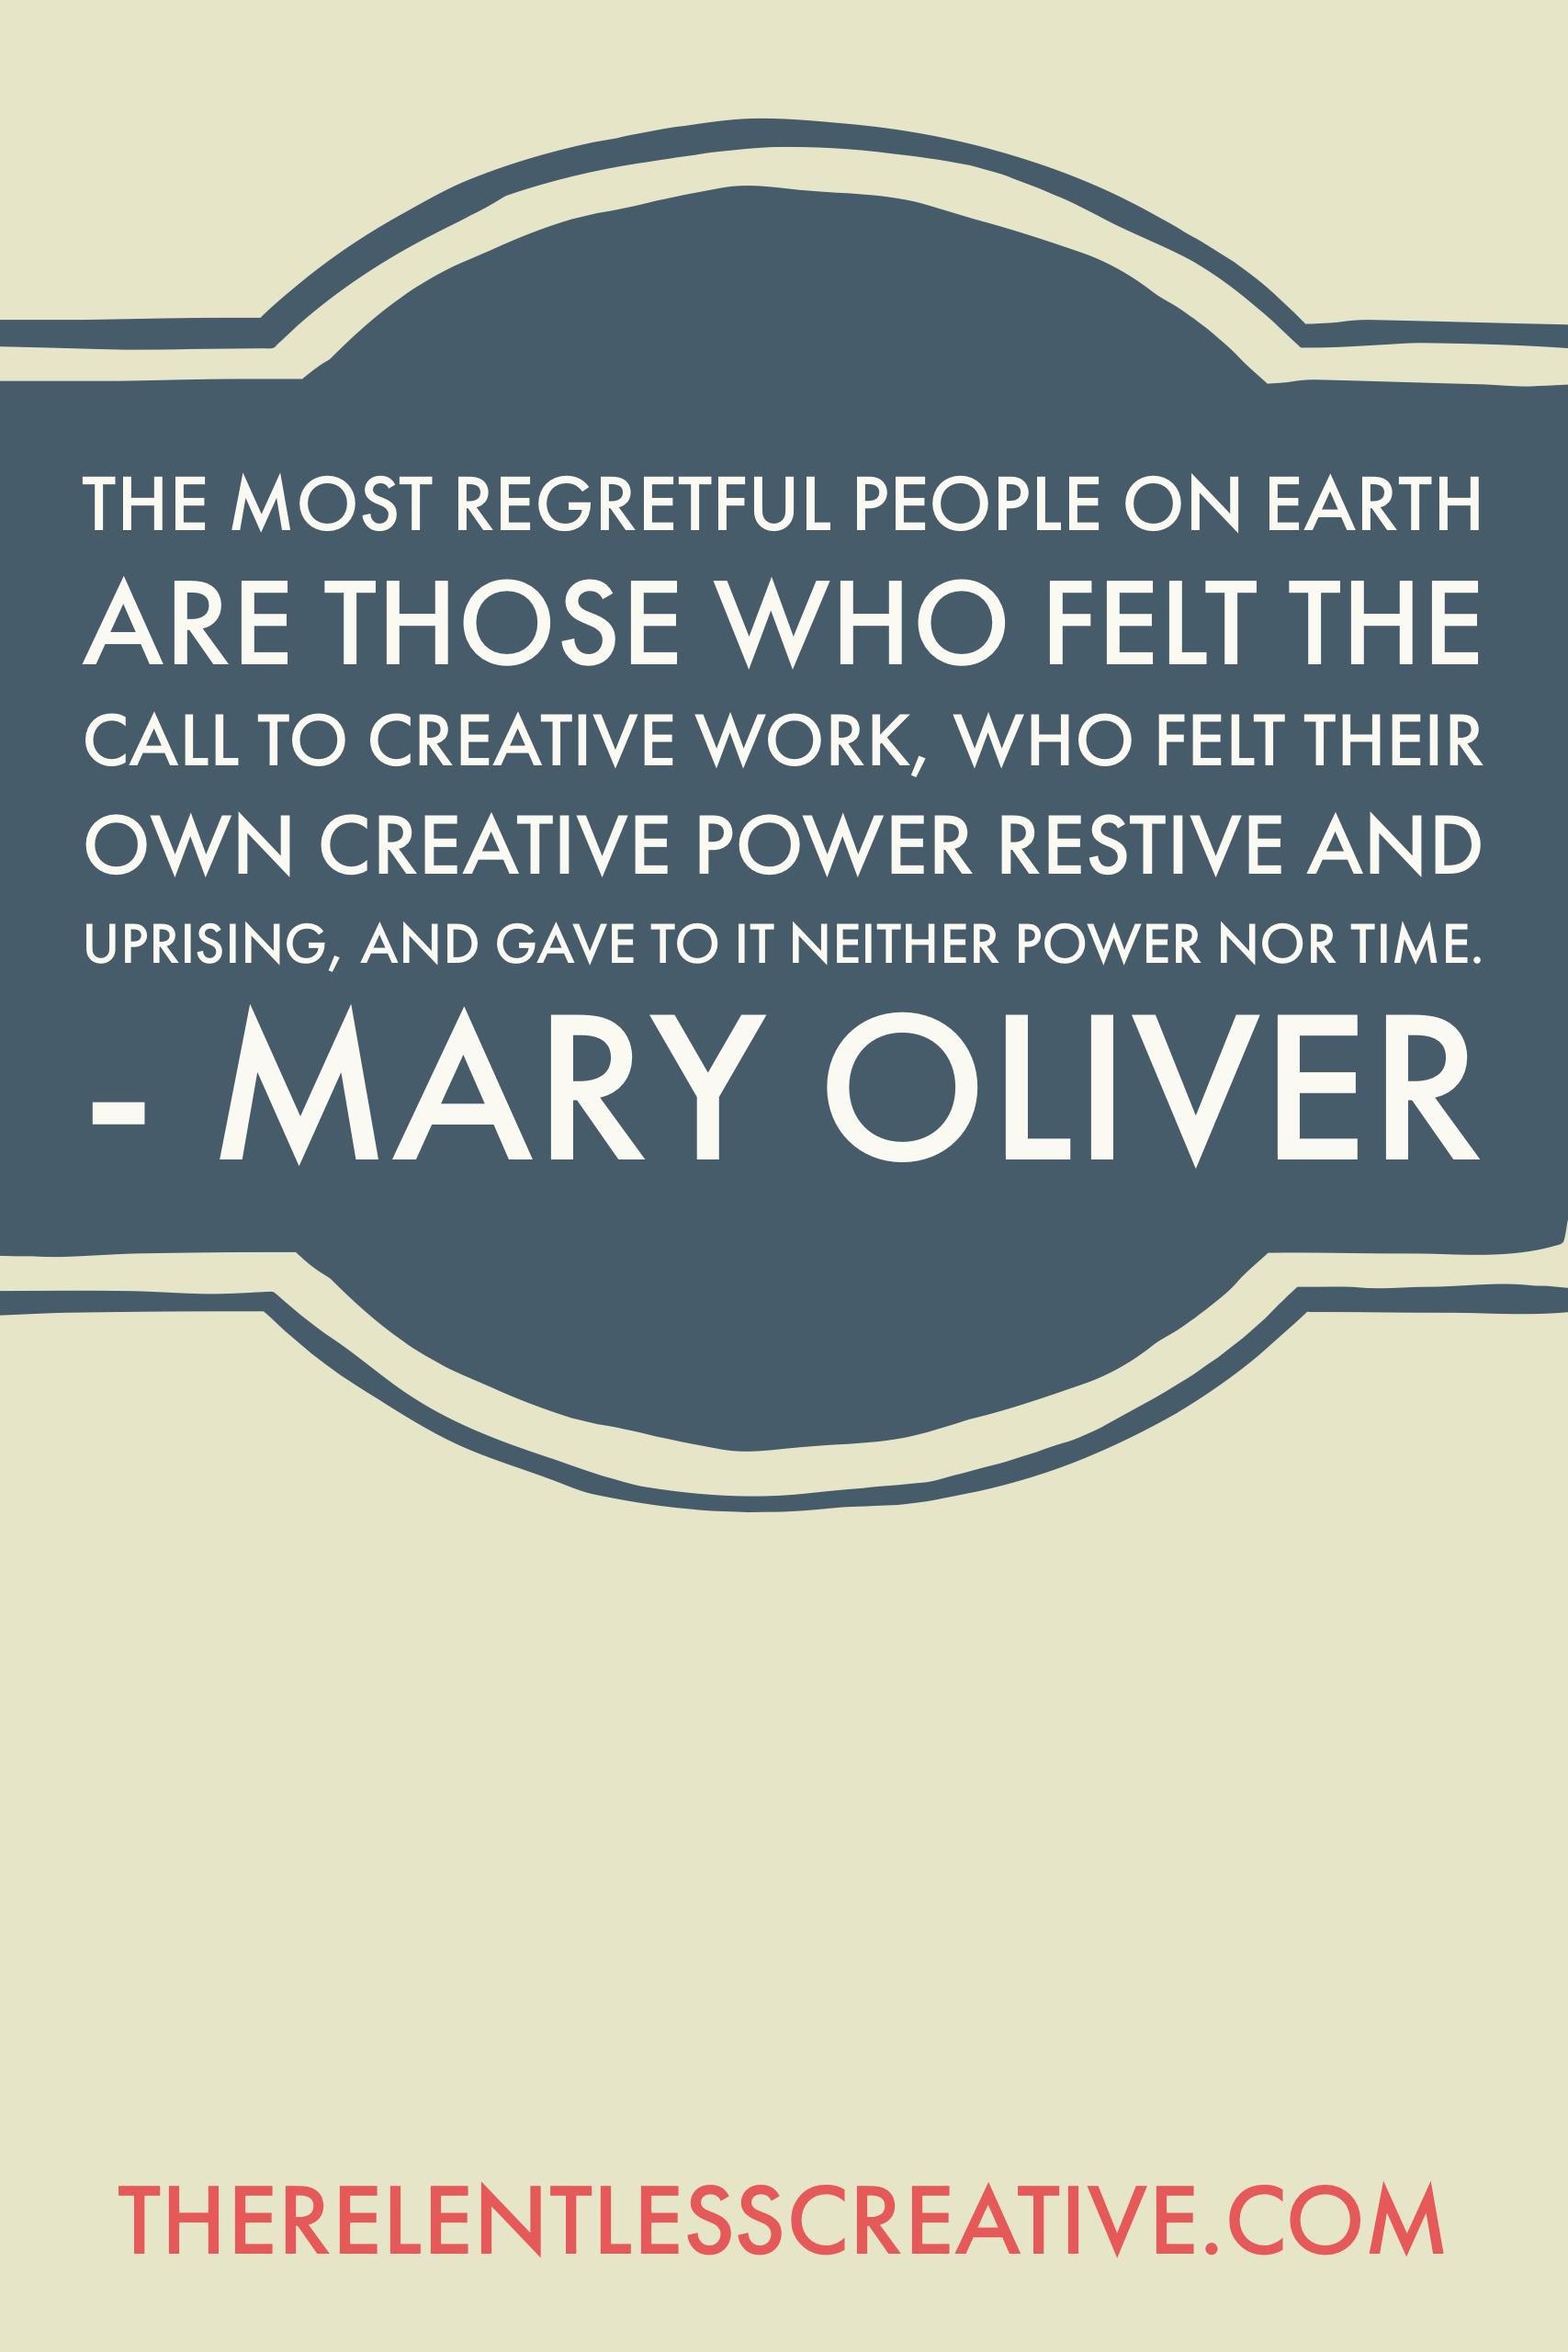 Call to creative work